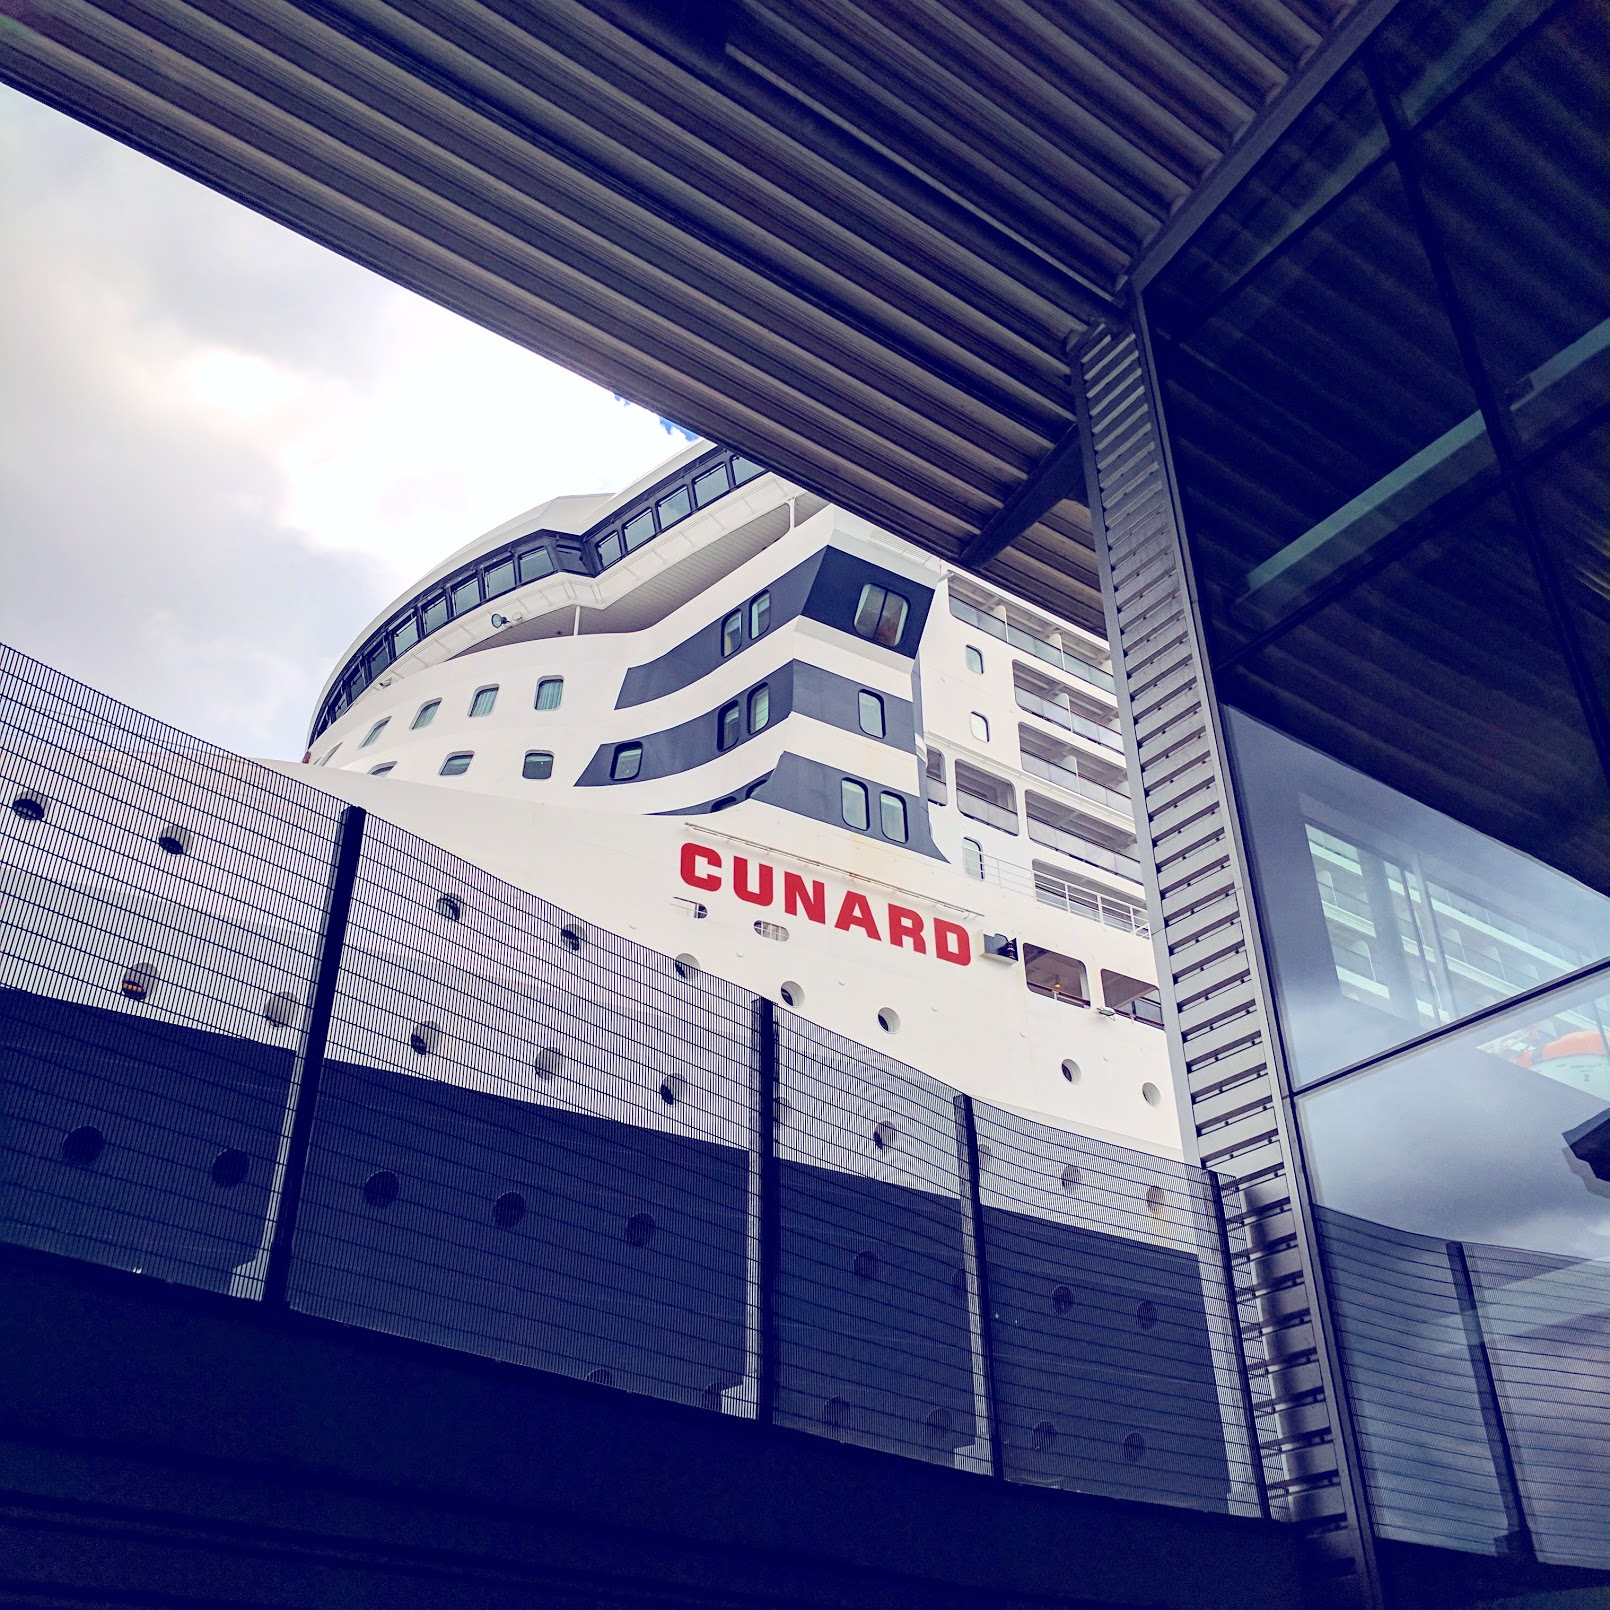 Cunard board.jpg